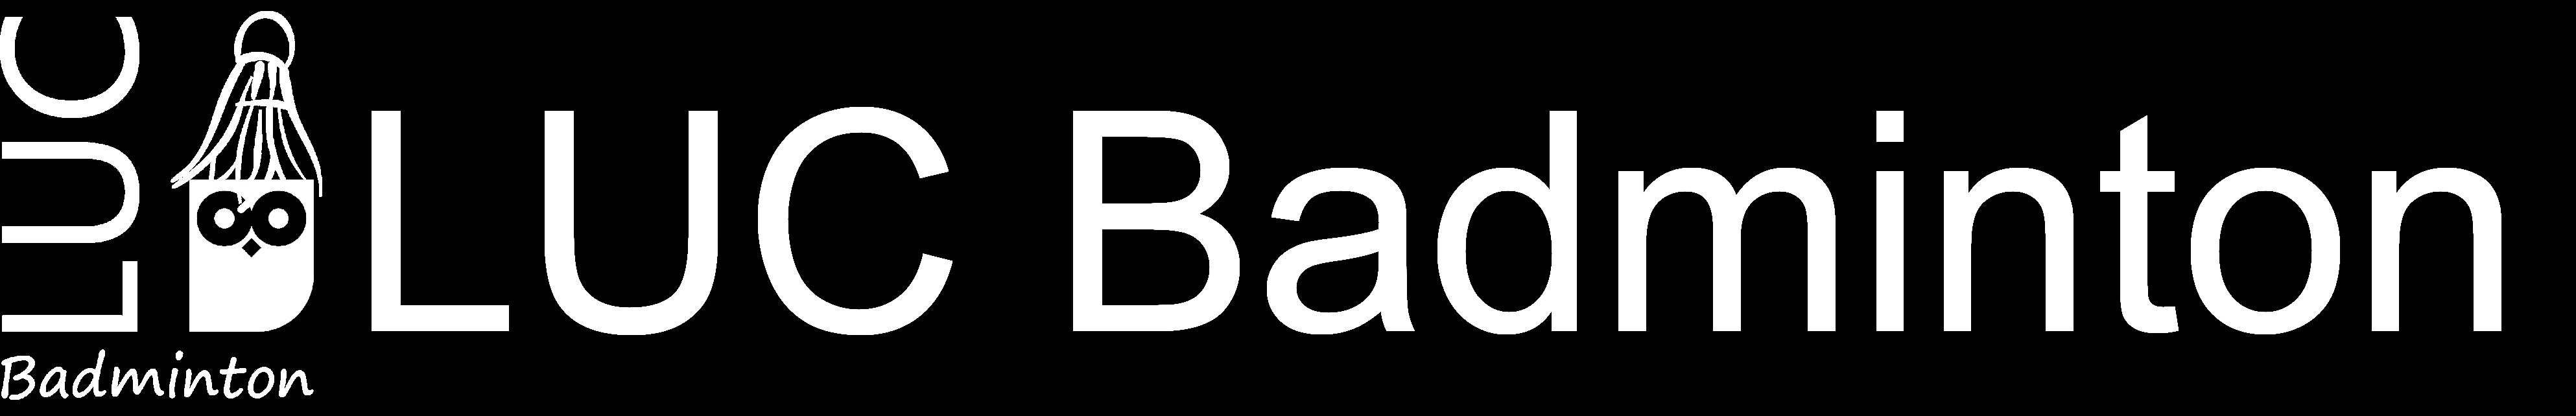 LUC Badminton